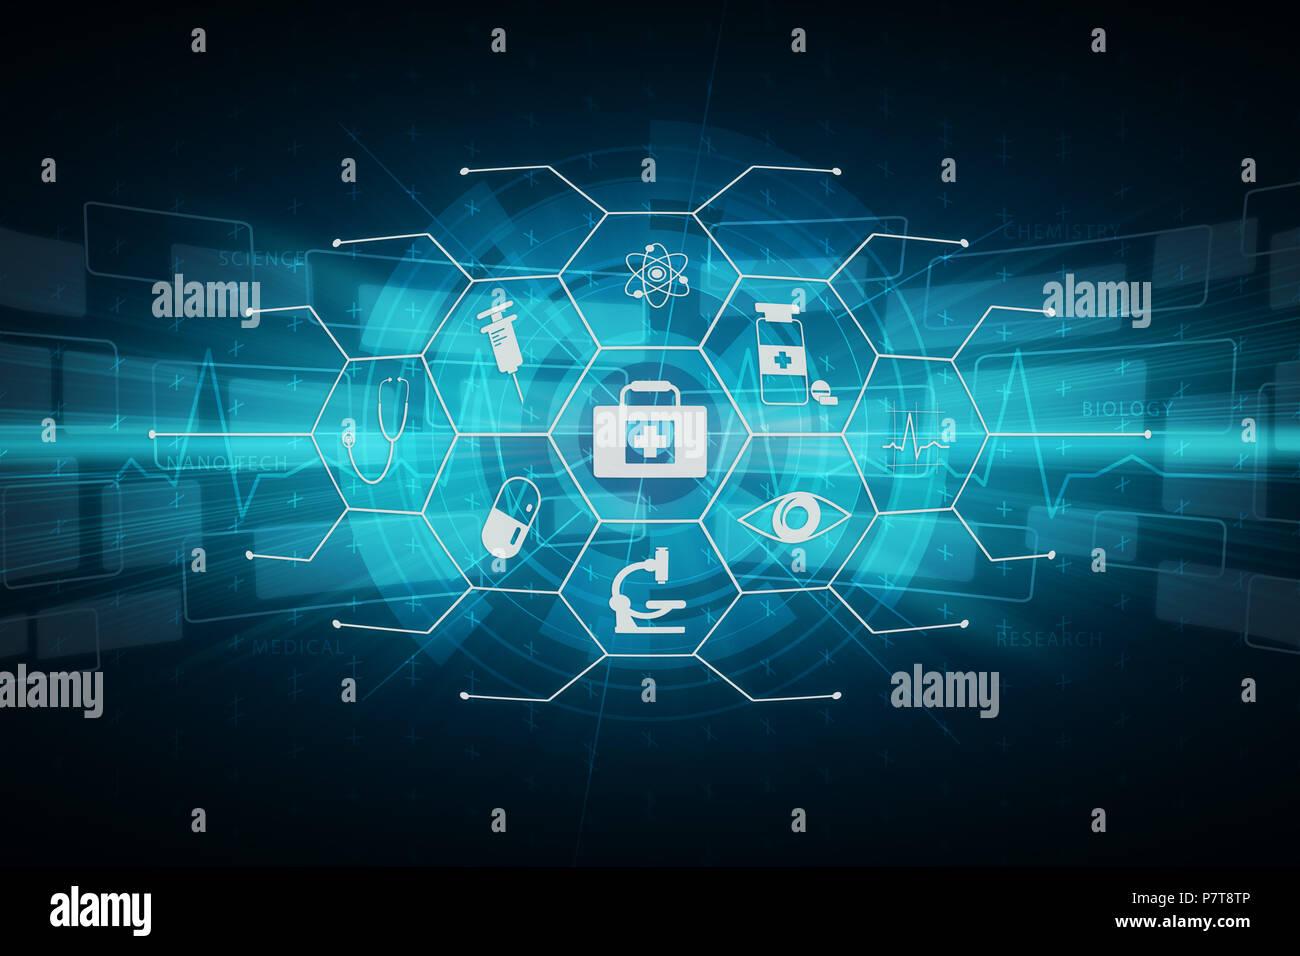 Moderner Mix media overlay Science Medical Healthcare das Symbol Grafik illustration Kunst Hintergrund Design für Hintergrundbild. Stockbild